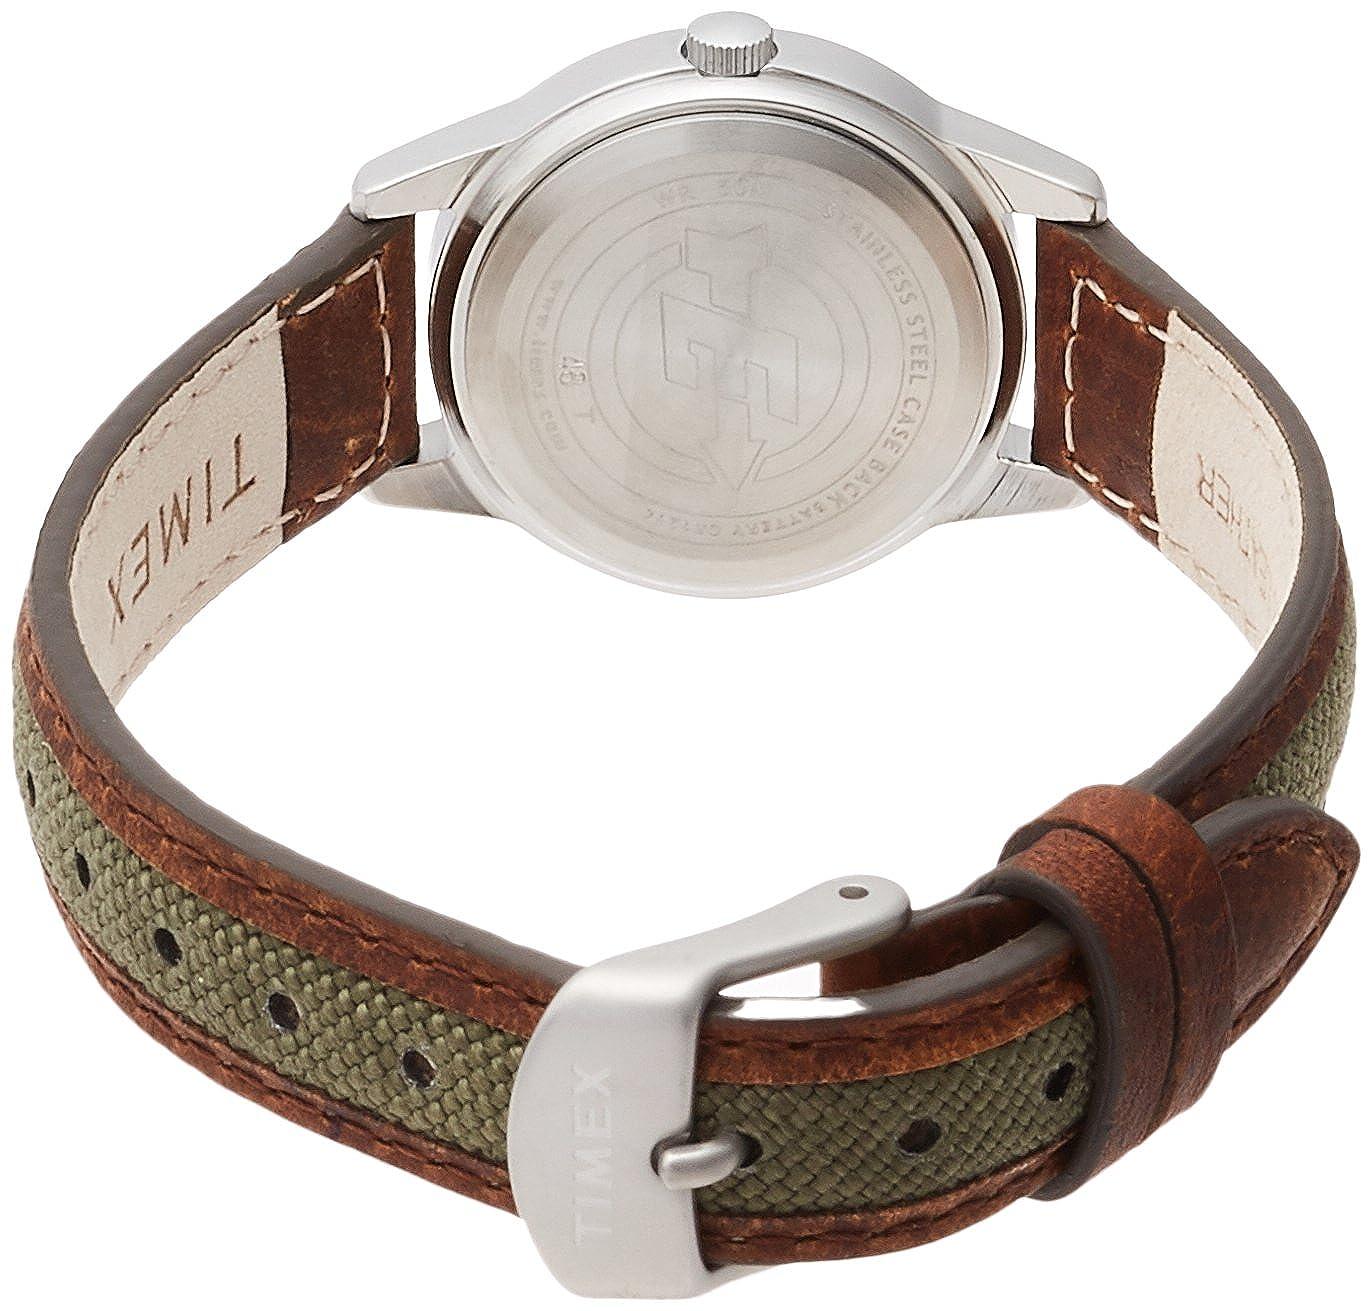 18f1a2ea96 Amazon | [タイメックス]TIMEX フィールドミニ グリーン TW4B12000 【正規輸入品】 | レディース腕時計 | 腕時計 通販